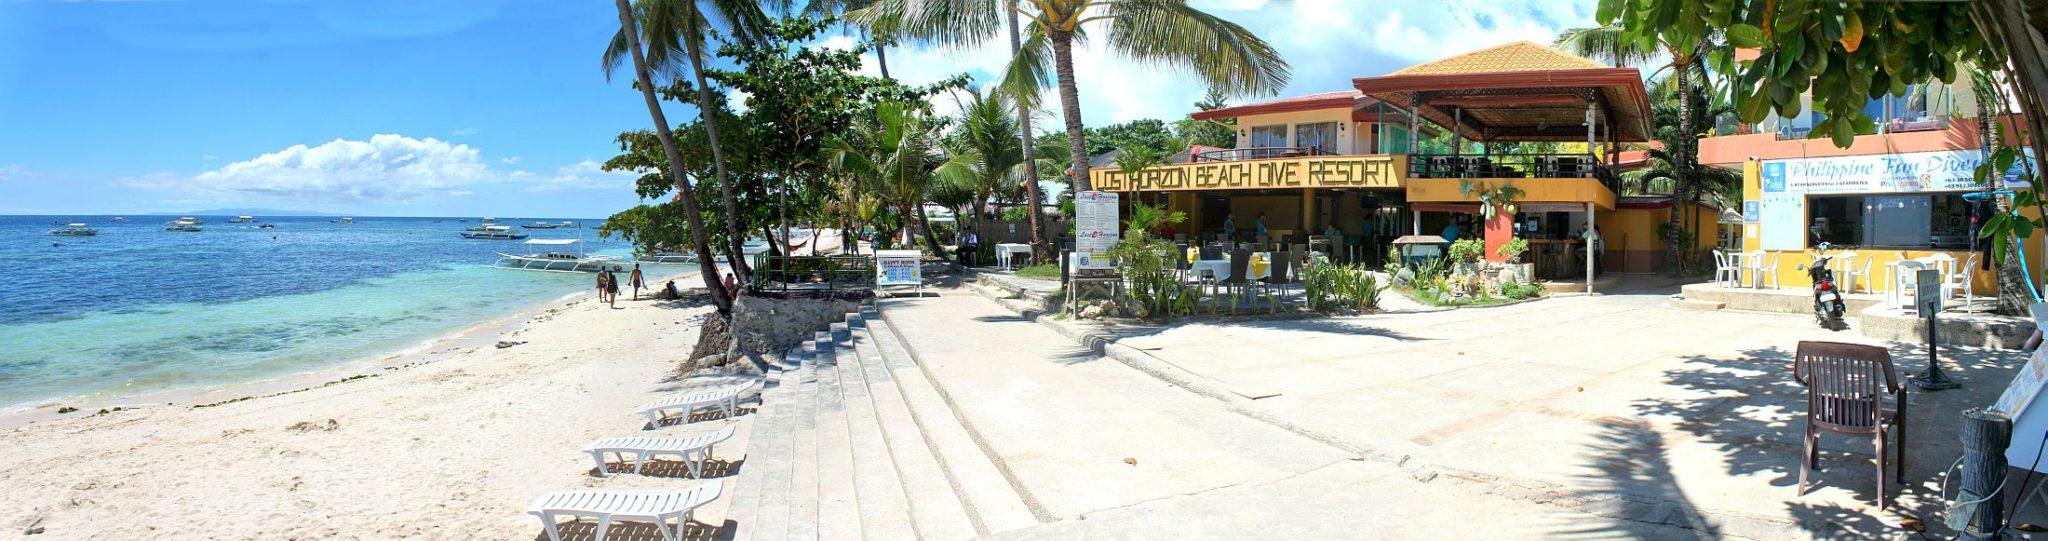 Top 10 Beach Resorts In Bohol For Summer   Info Bohol